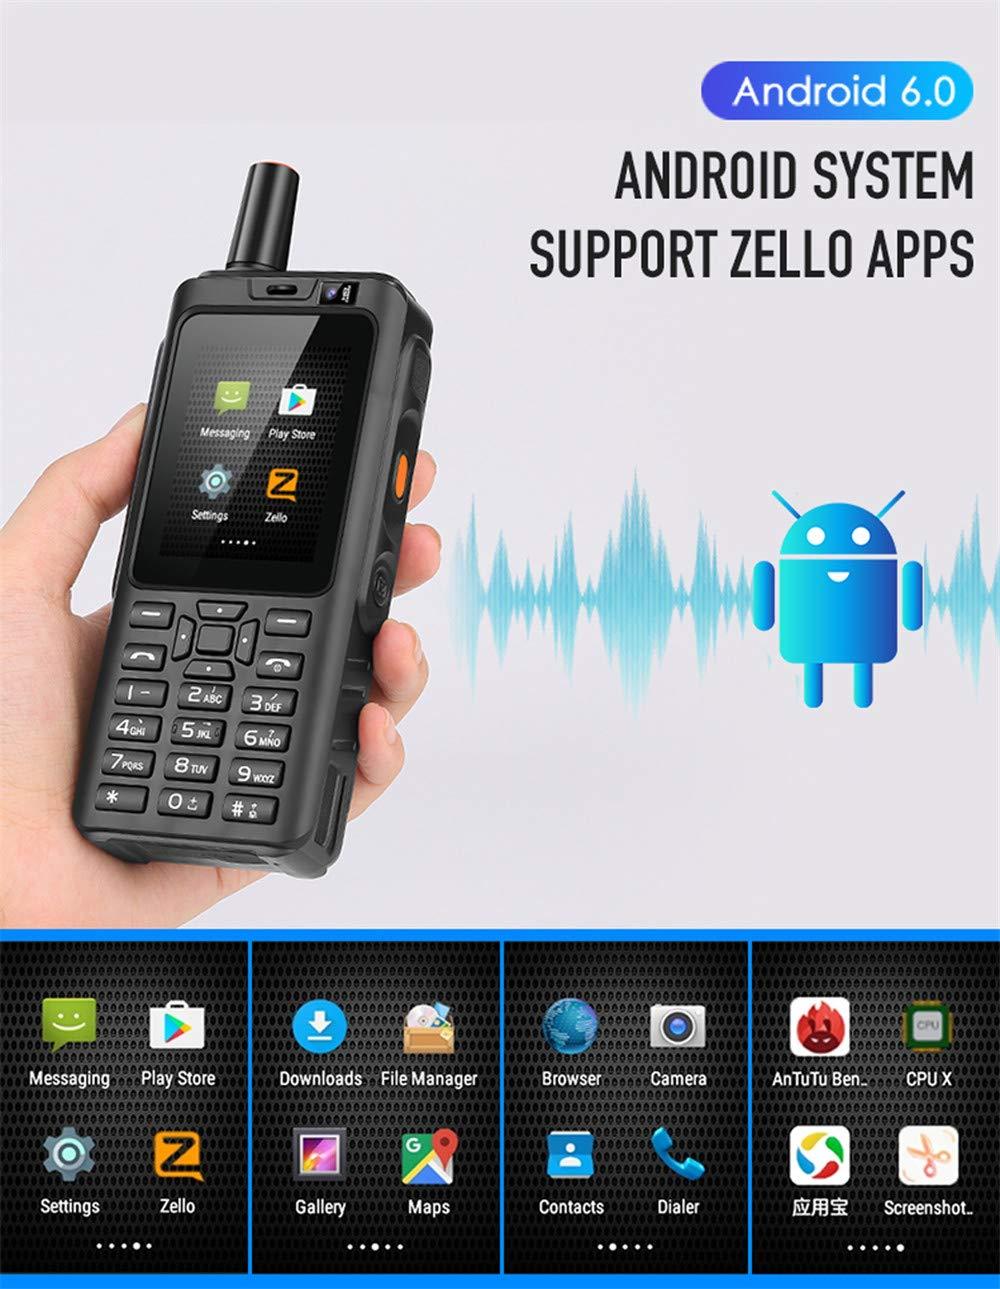 Alps F40 Zello Walkie Talkie 4G Mobile Phone IP65 Waterproof ...